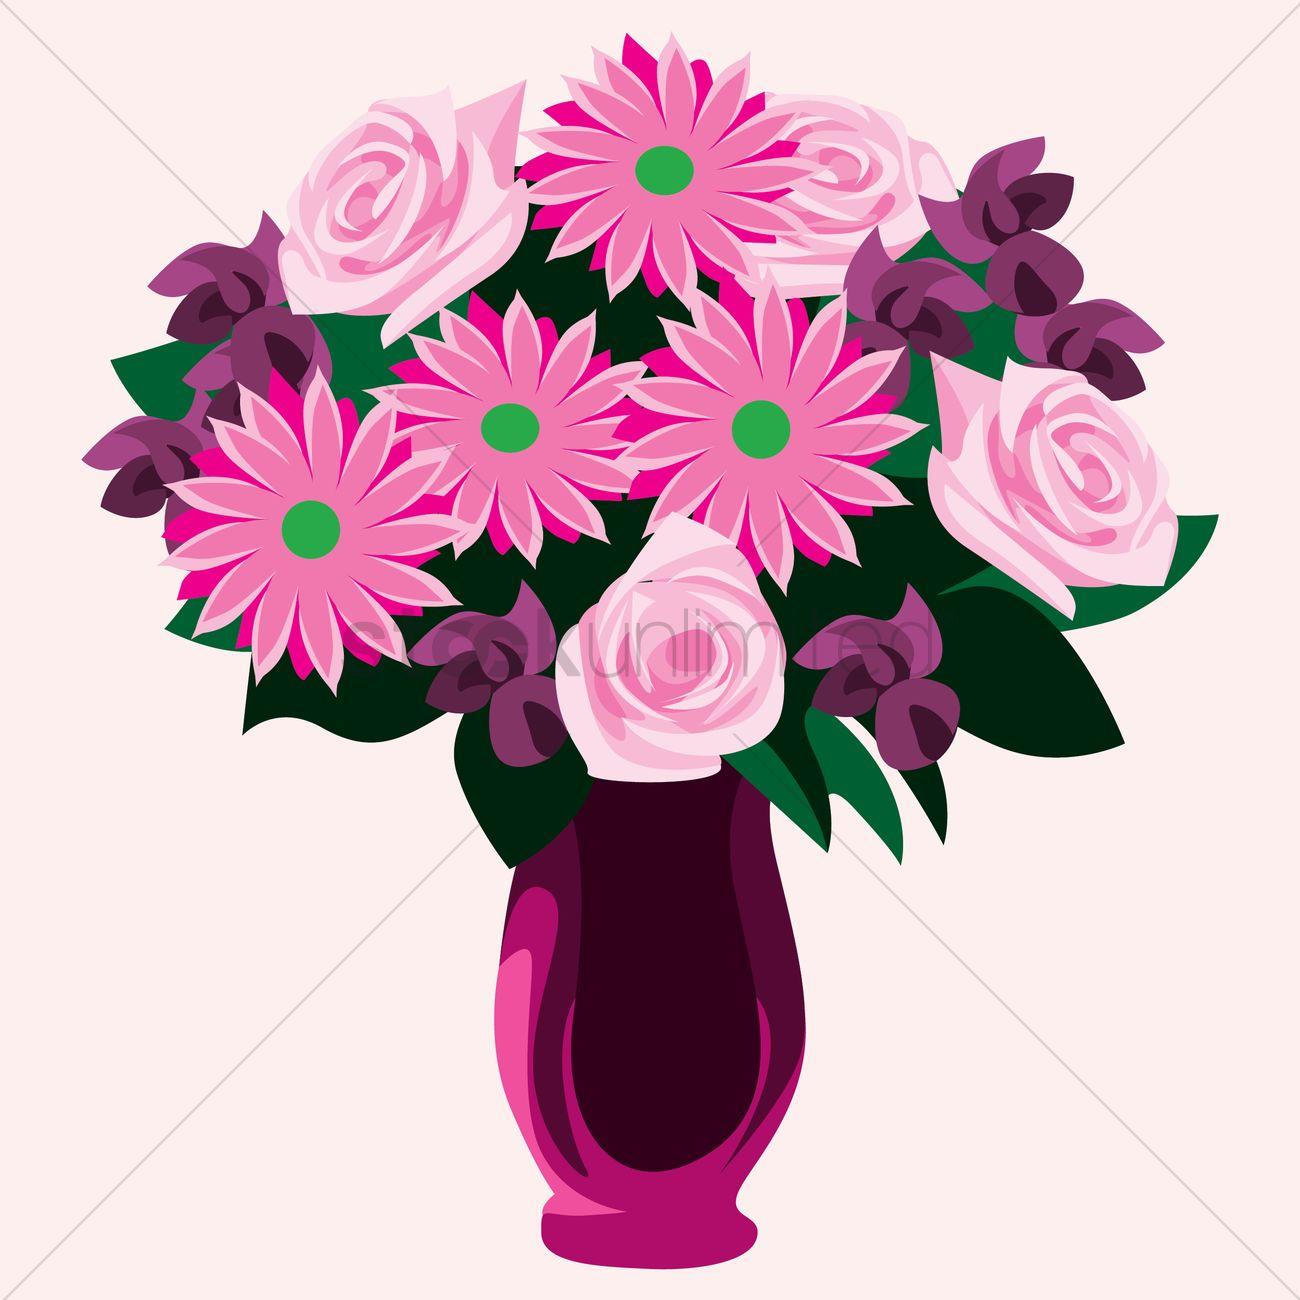 Free Dahlia and roses flowers in vase Vector Image - 1459776 ... on books vector, basket vector, art vector, box vector, decor vector, candle vector, animals vector, roses vector, floral vector, pottery vector, mirror vector, beer mug vector, teapot vector,